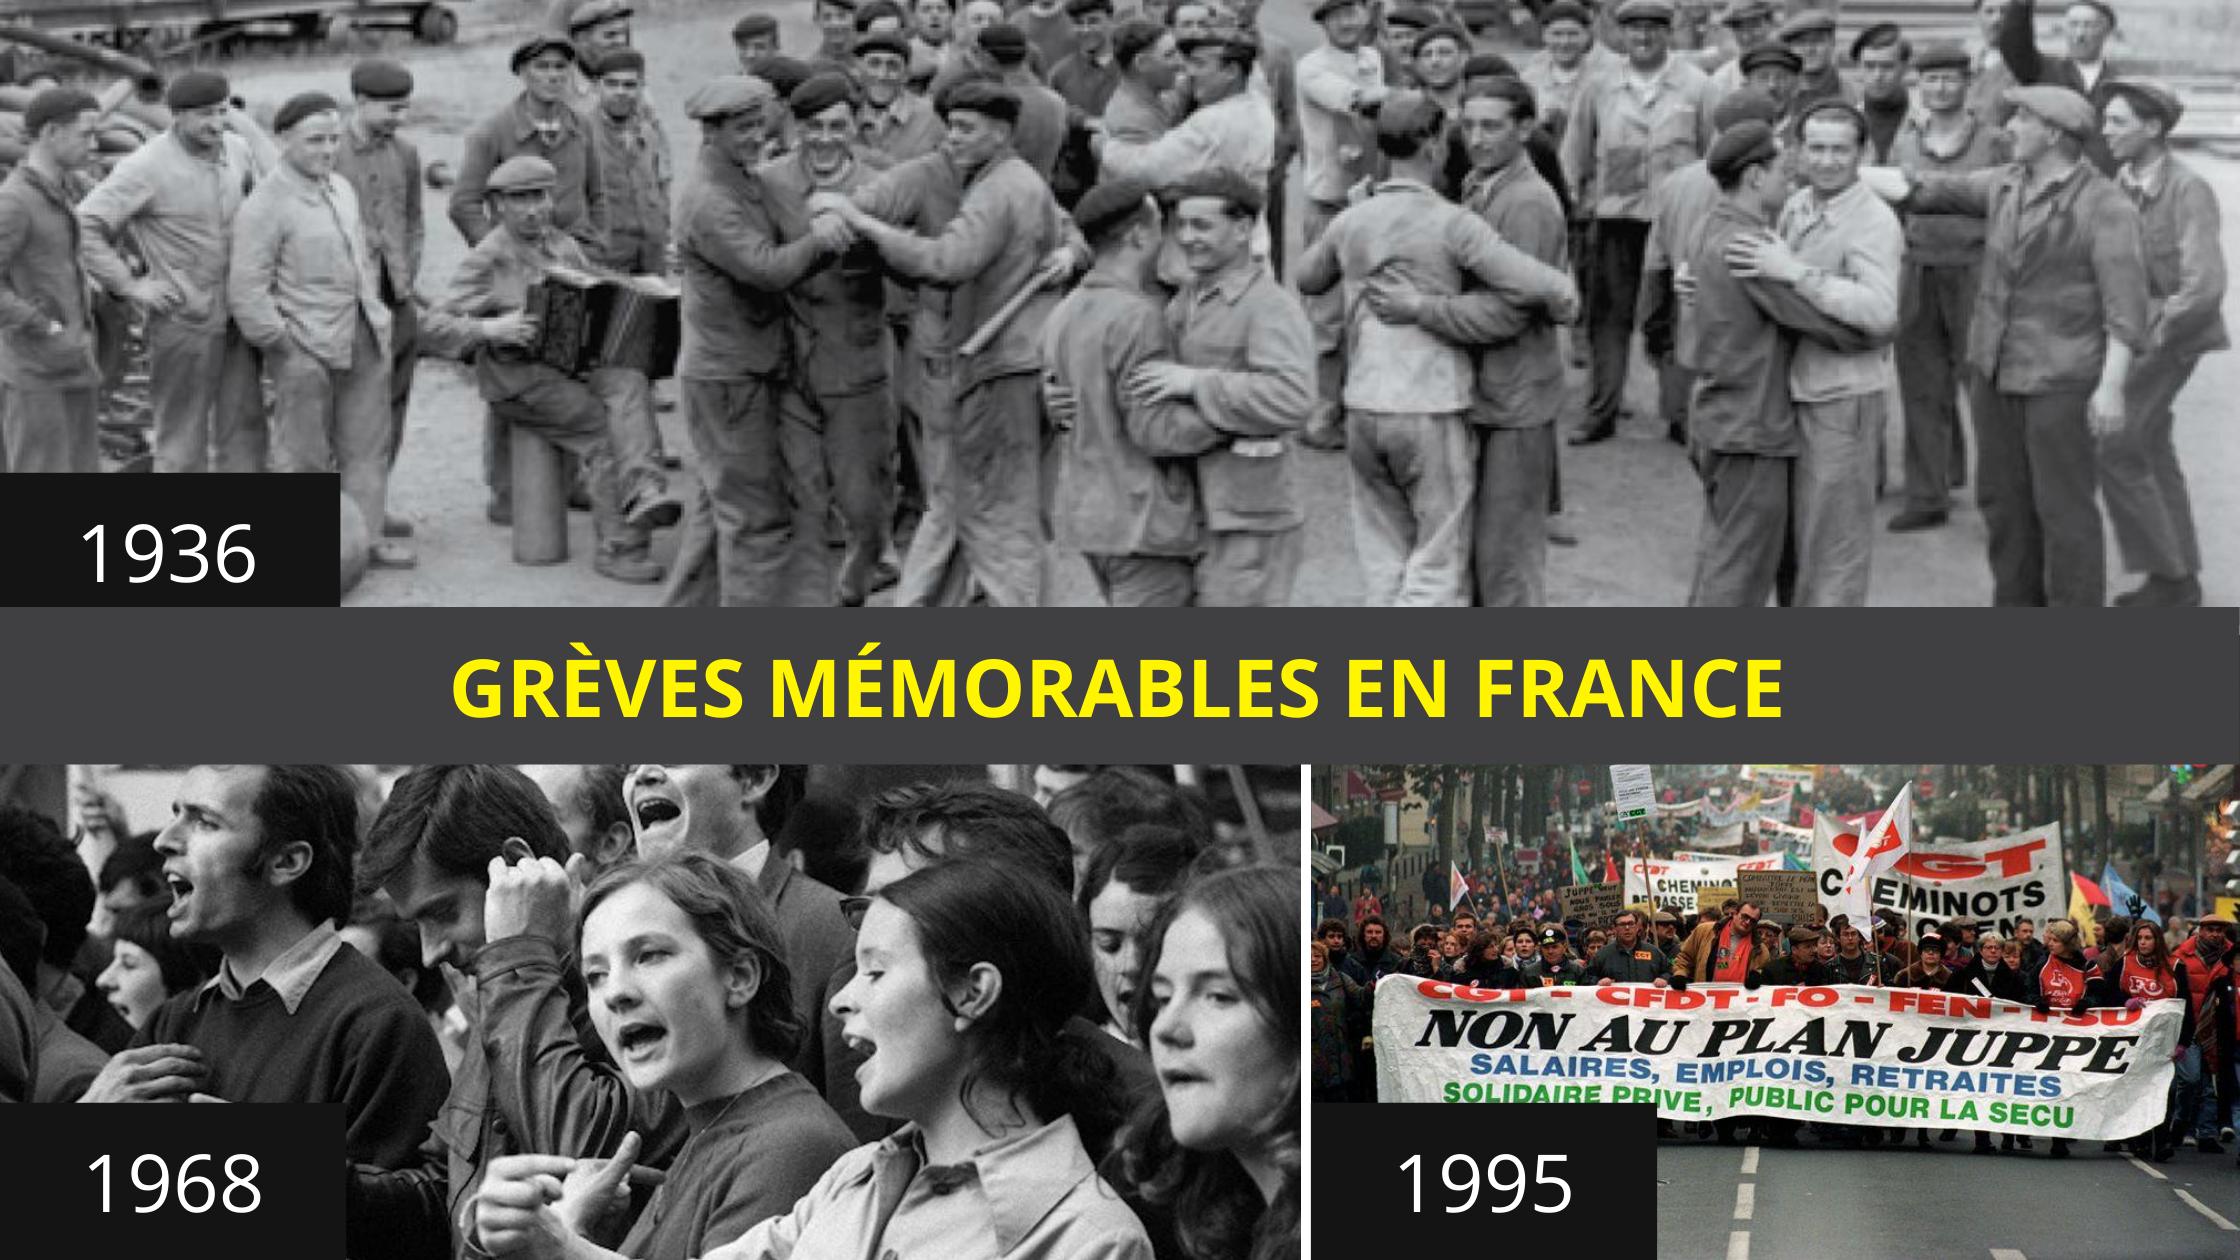 FUSM_3 Grèves Remarquables